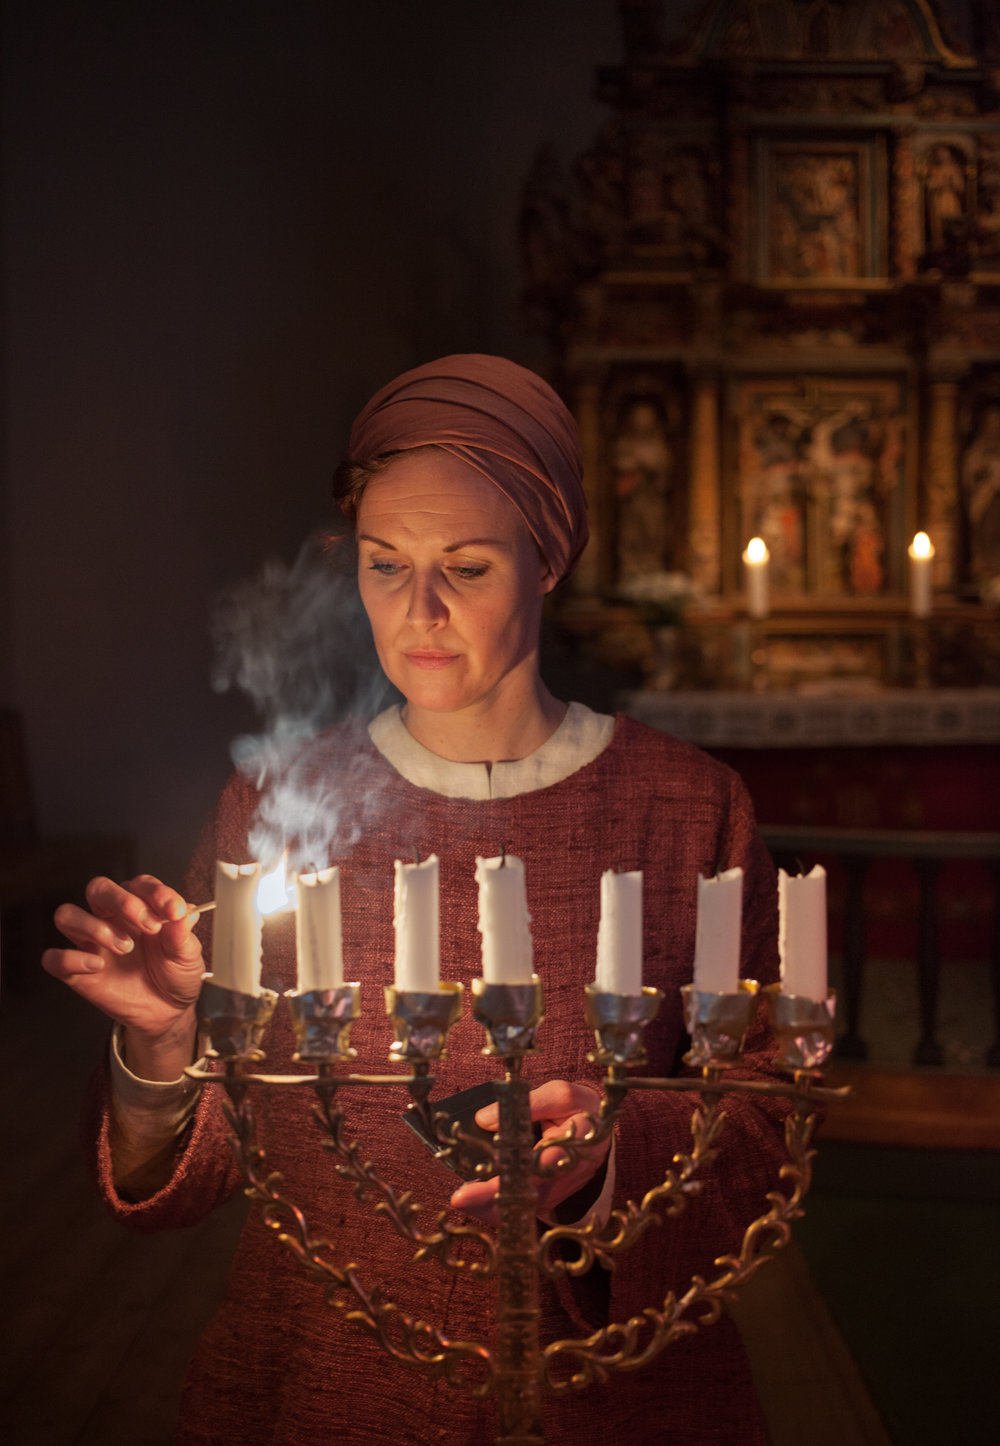 Miriam si forteljing - Juleevangeliet (2017)